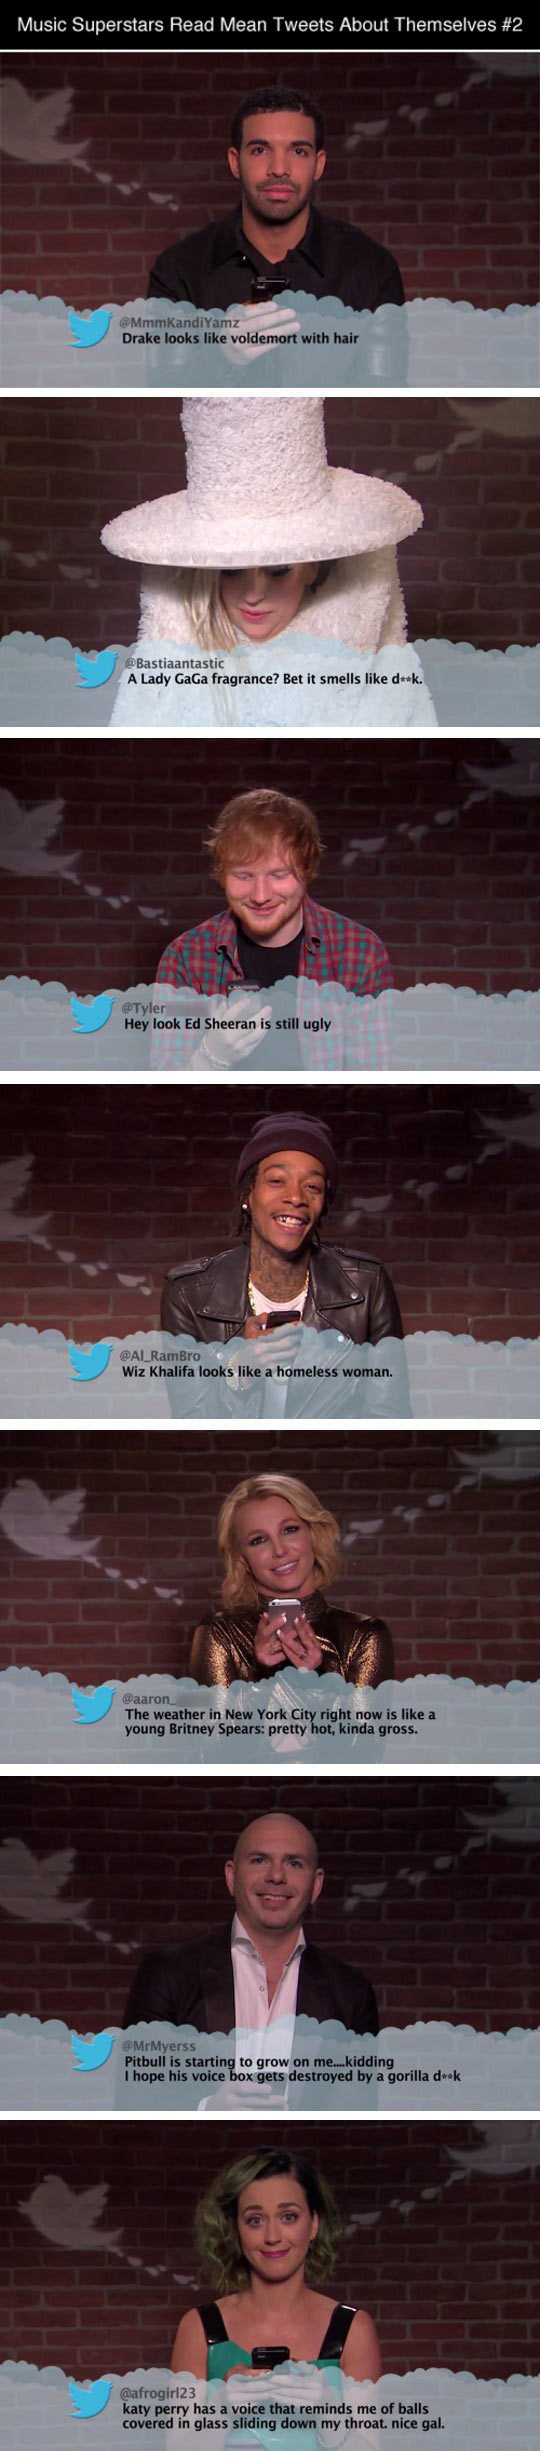 funny-mean tweets-celebrities-reading